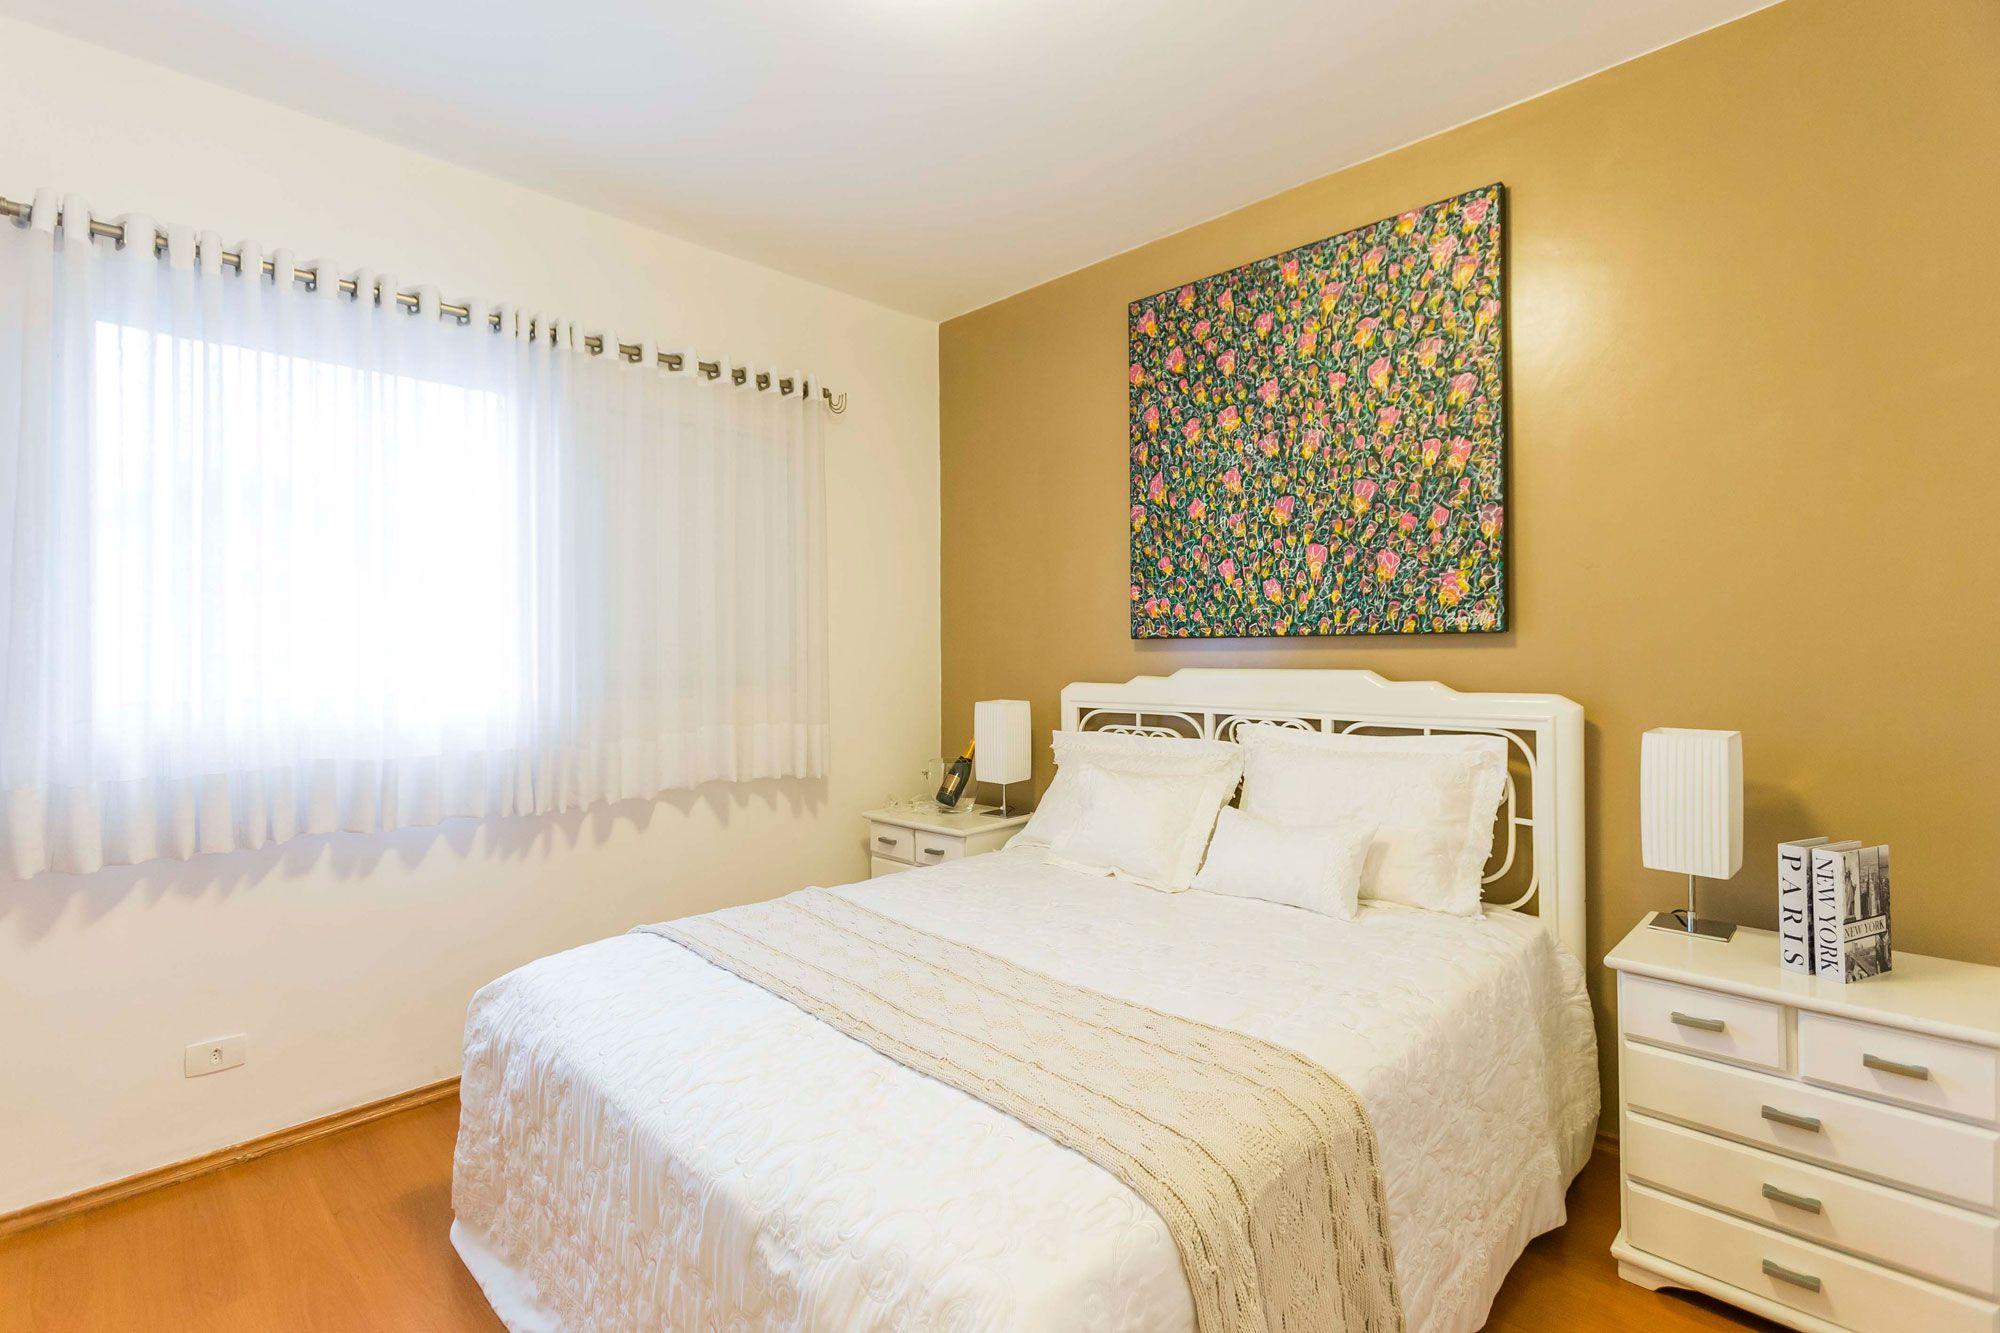 Granja-Julieta-Residence-27